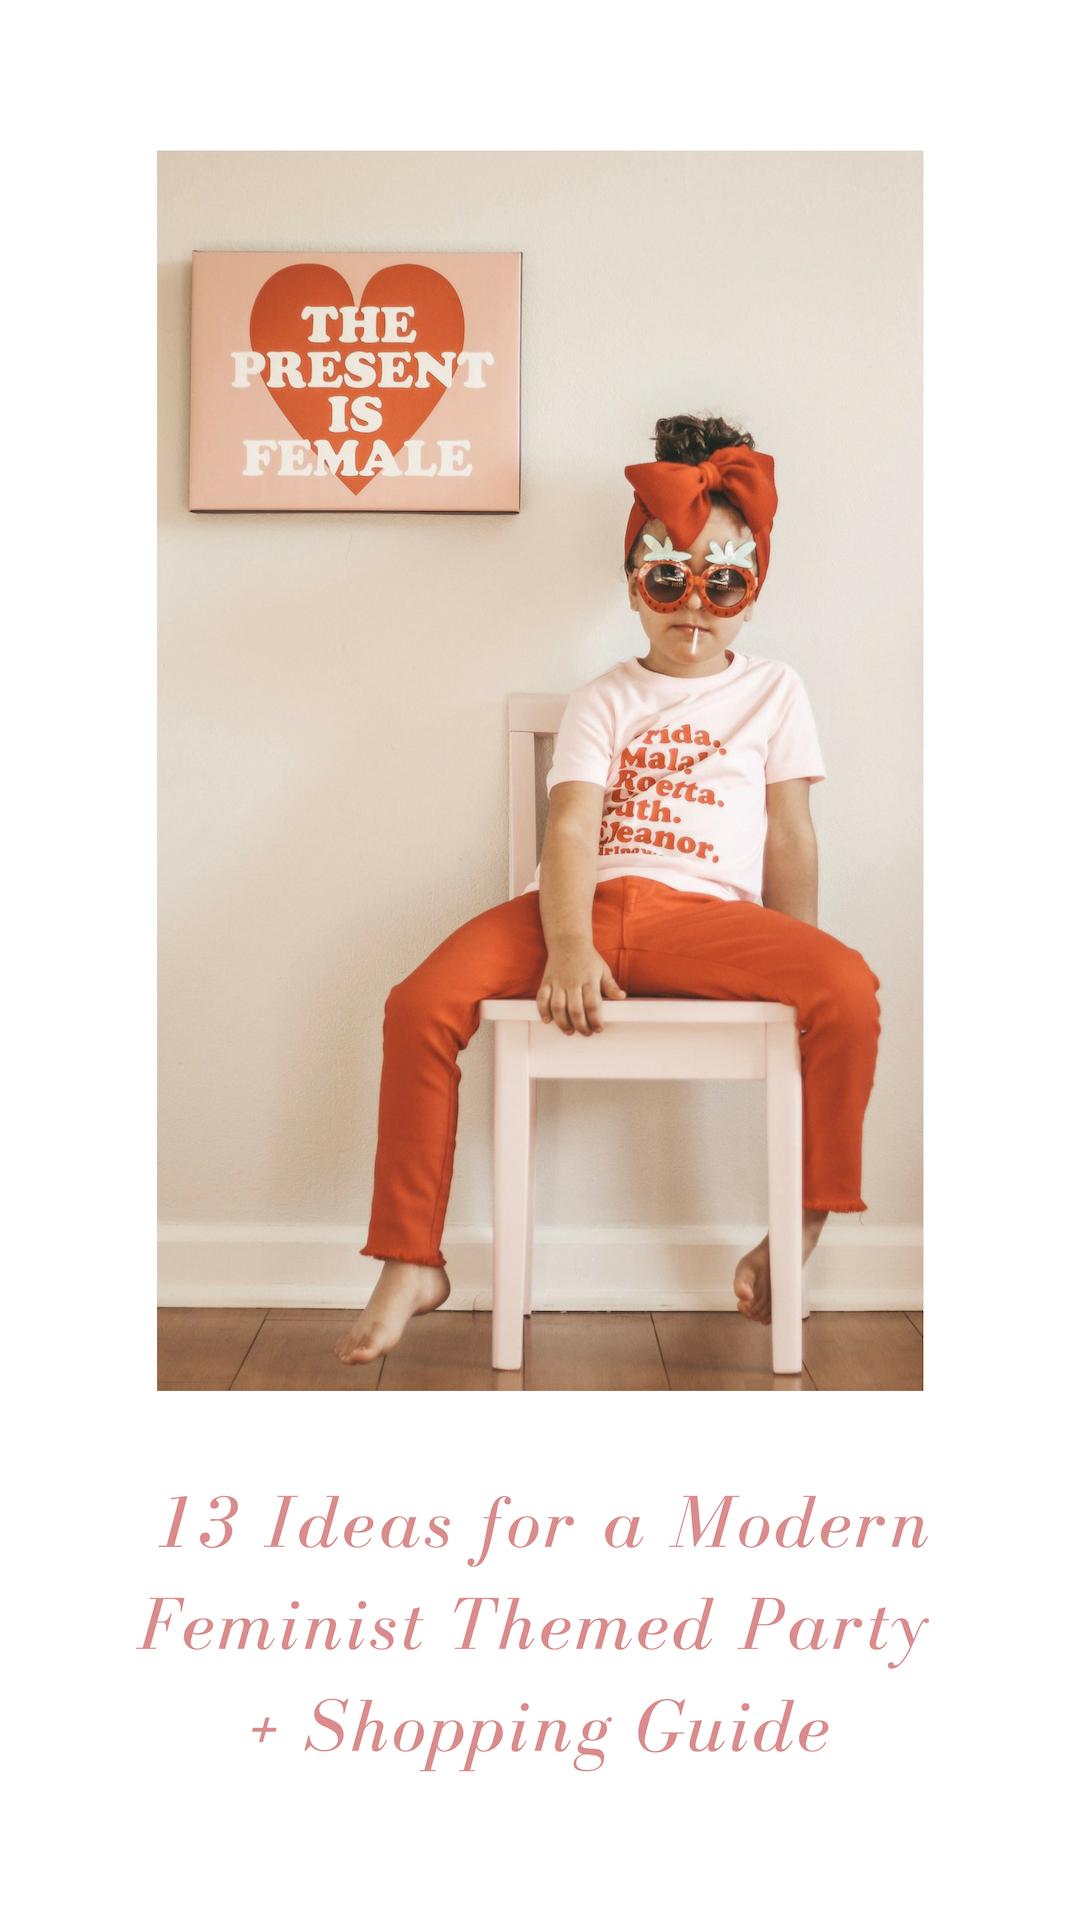 Gennifer Rose_Modern Feminist Themed Party.png